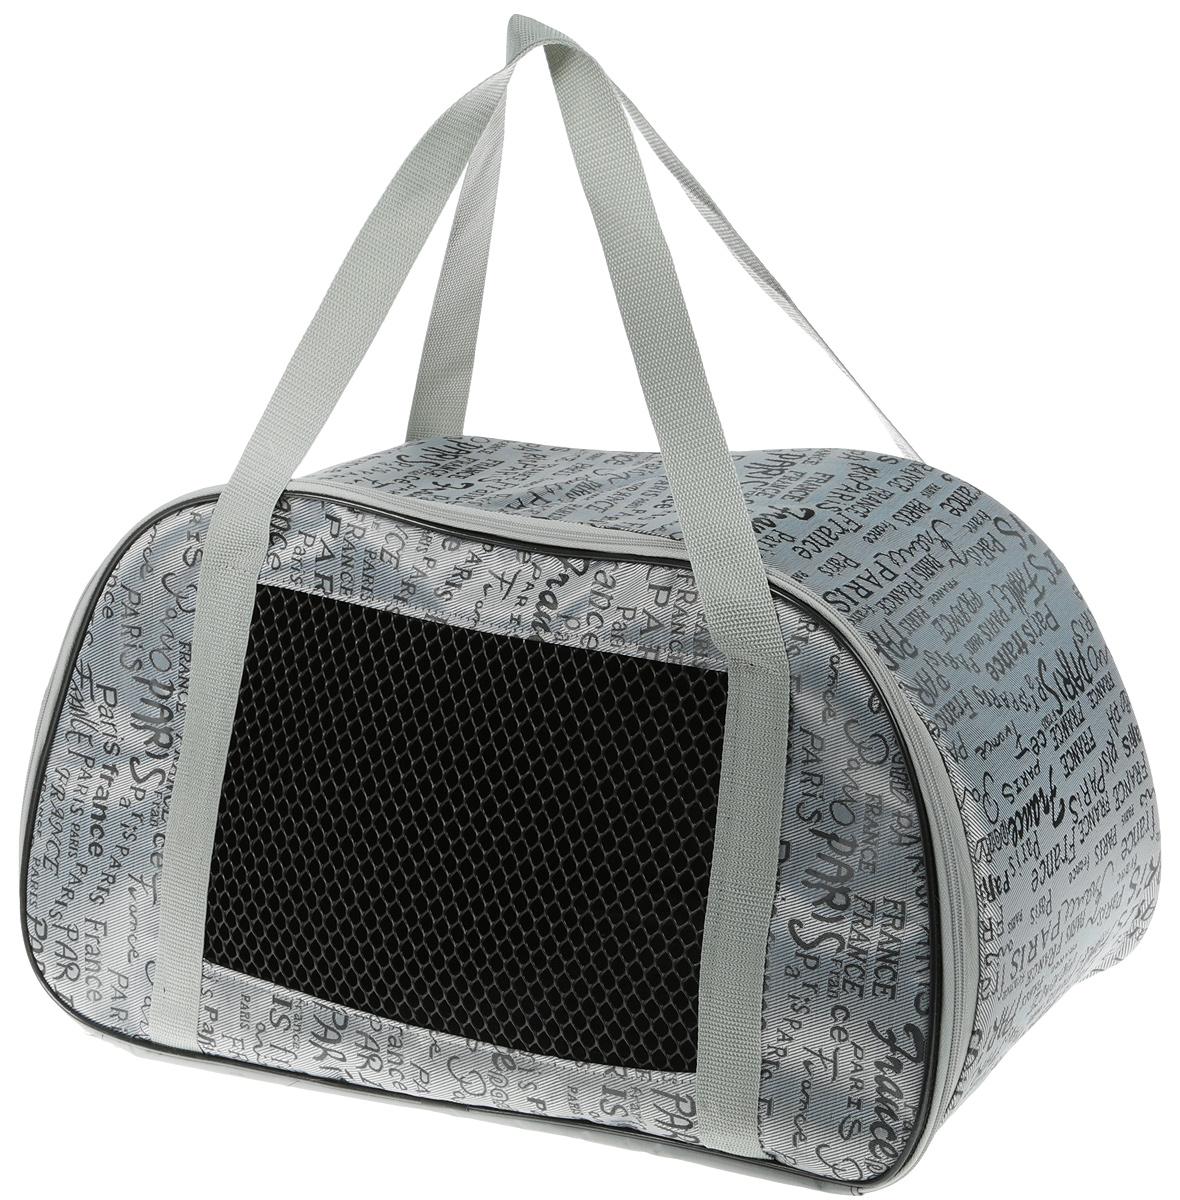 Сумка-переноска для животных Теремок, цвет: хаки, 56 х 28 х 30 см переноска теремок сумка переноска для животных трапеция 28 30 53 см темно зеленый